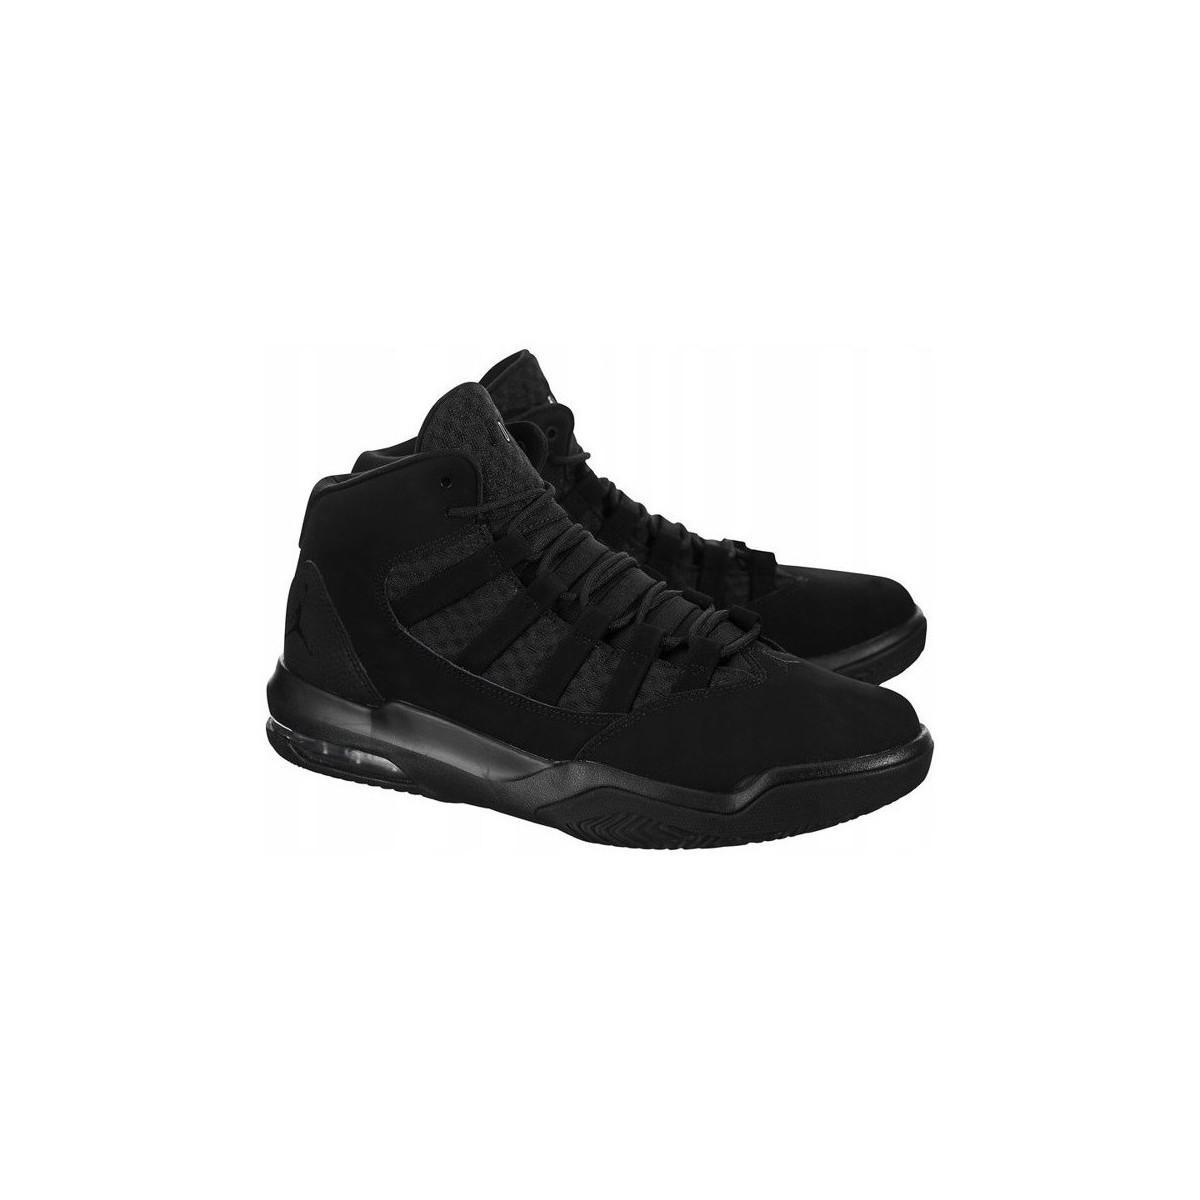 16954f4b7abc2e Nike Air Jordan Max Aura Men s Shoes (high-top Trainers) In Black in ...